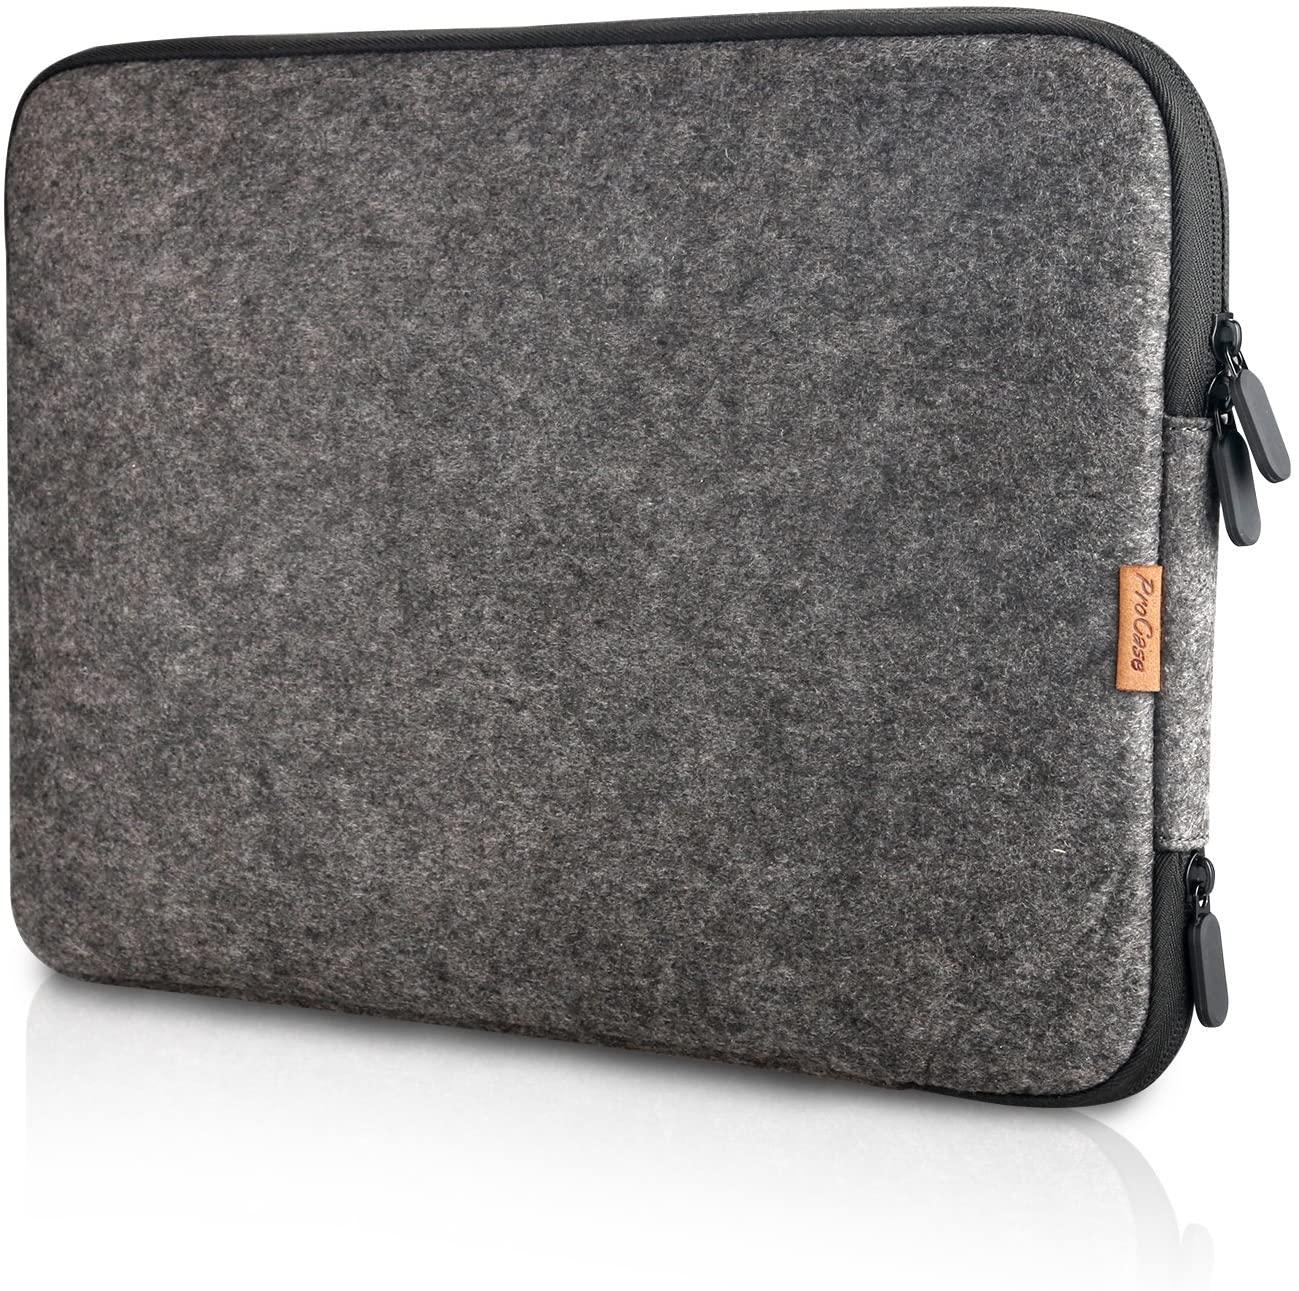 ProCase 13-13.5 Inch Felt Laptop Sleeve Case Bag for MacBook Pro Air, Surface Book 3 13.5